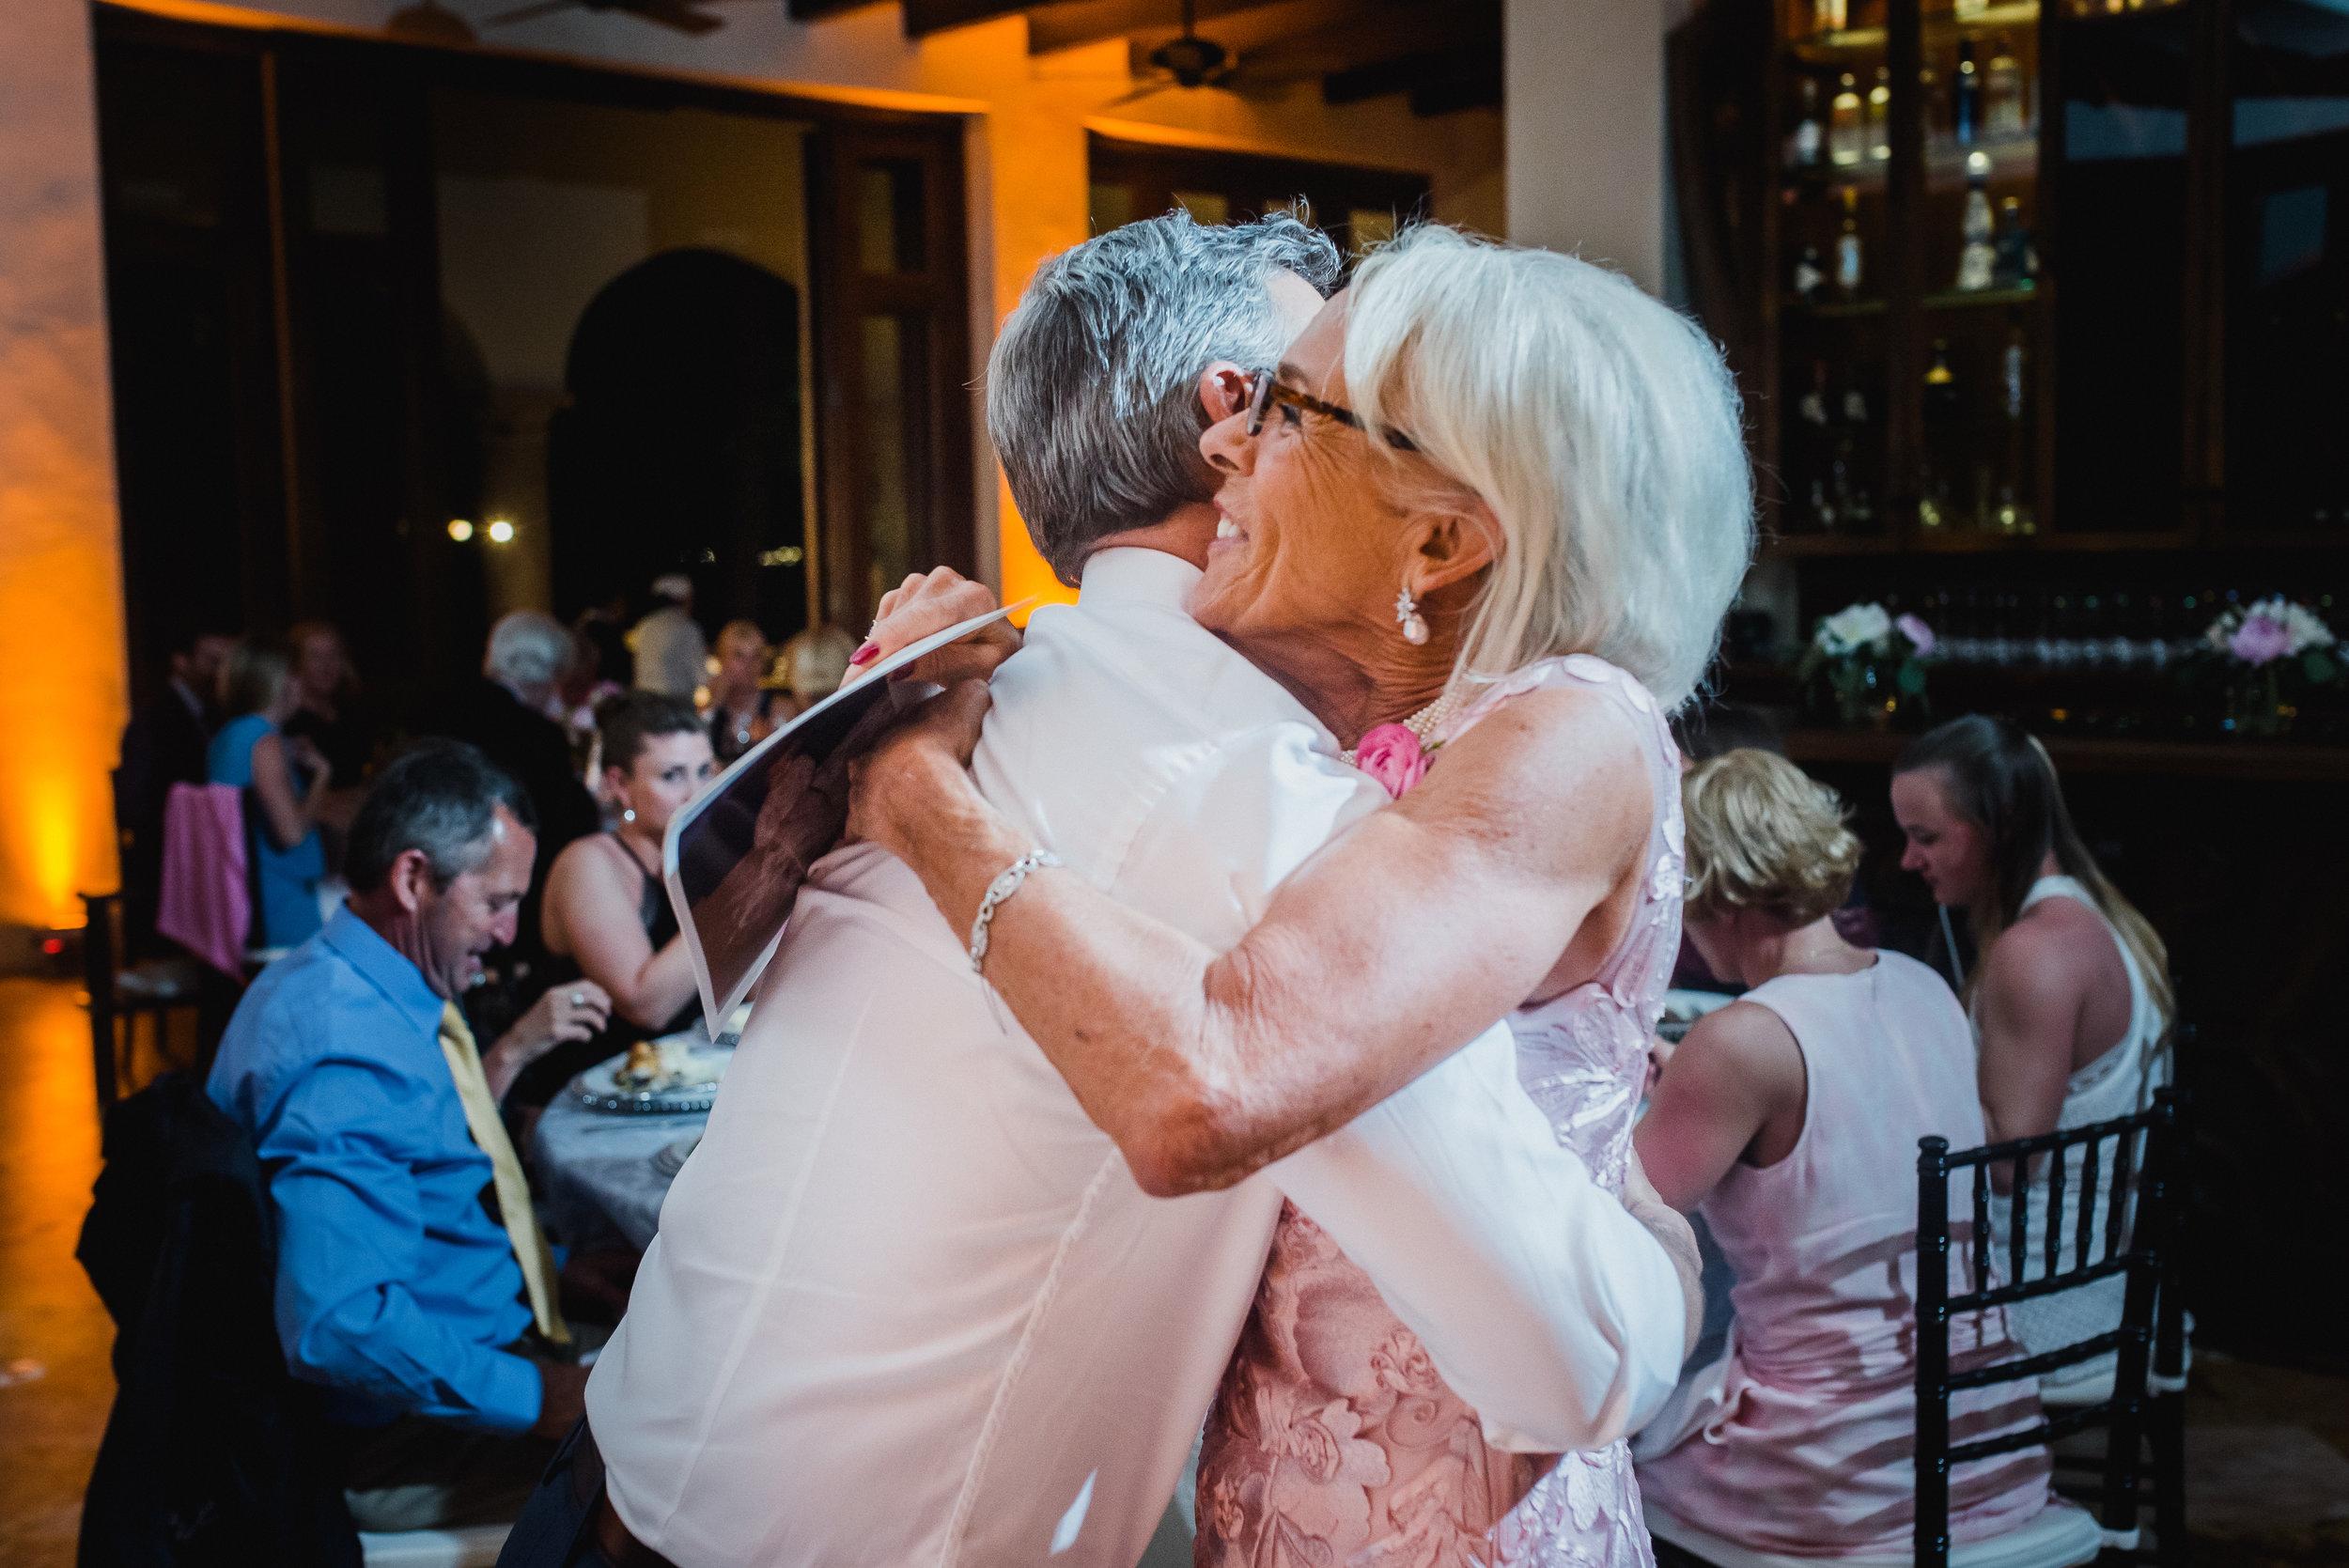 Cabo-destination-weddings-53.JPG